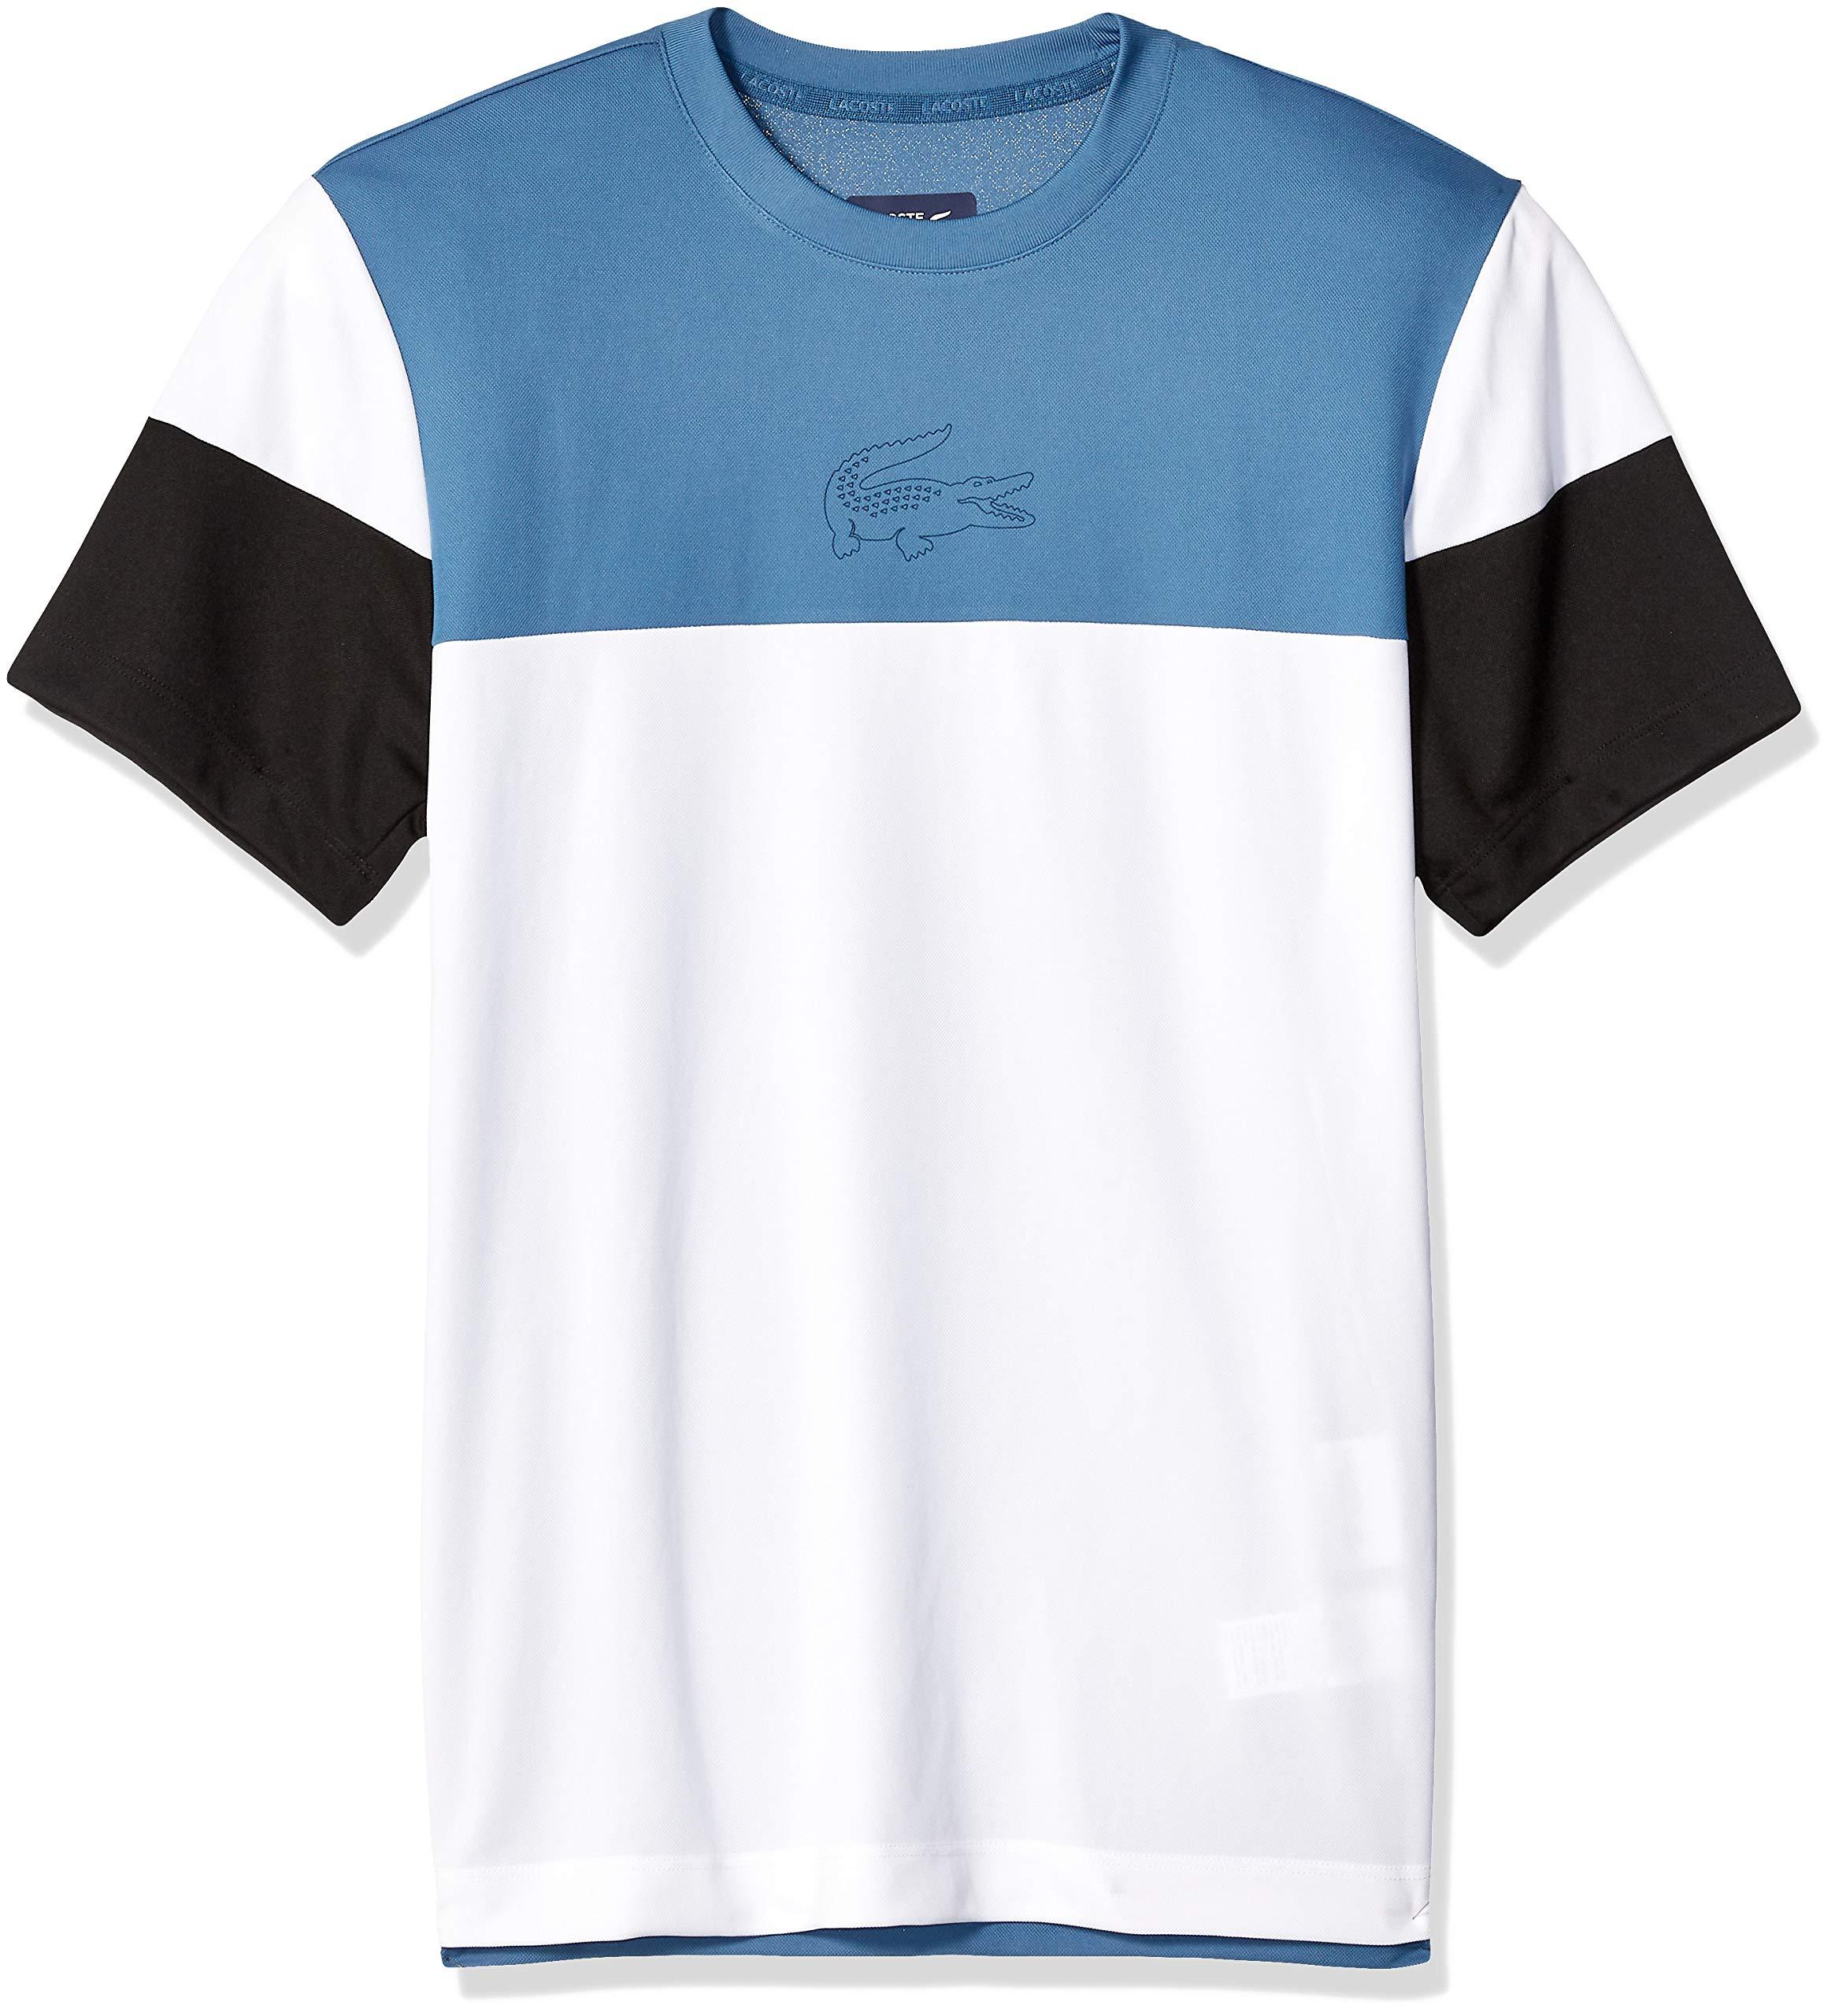 Lacoste Mens Short Sleeve Sport T-Shirt